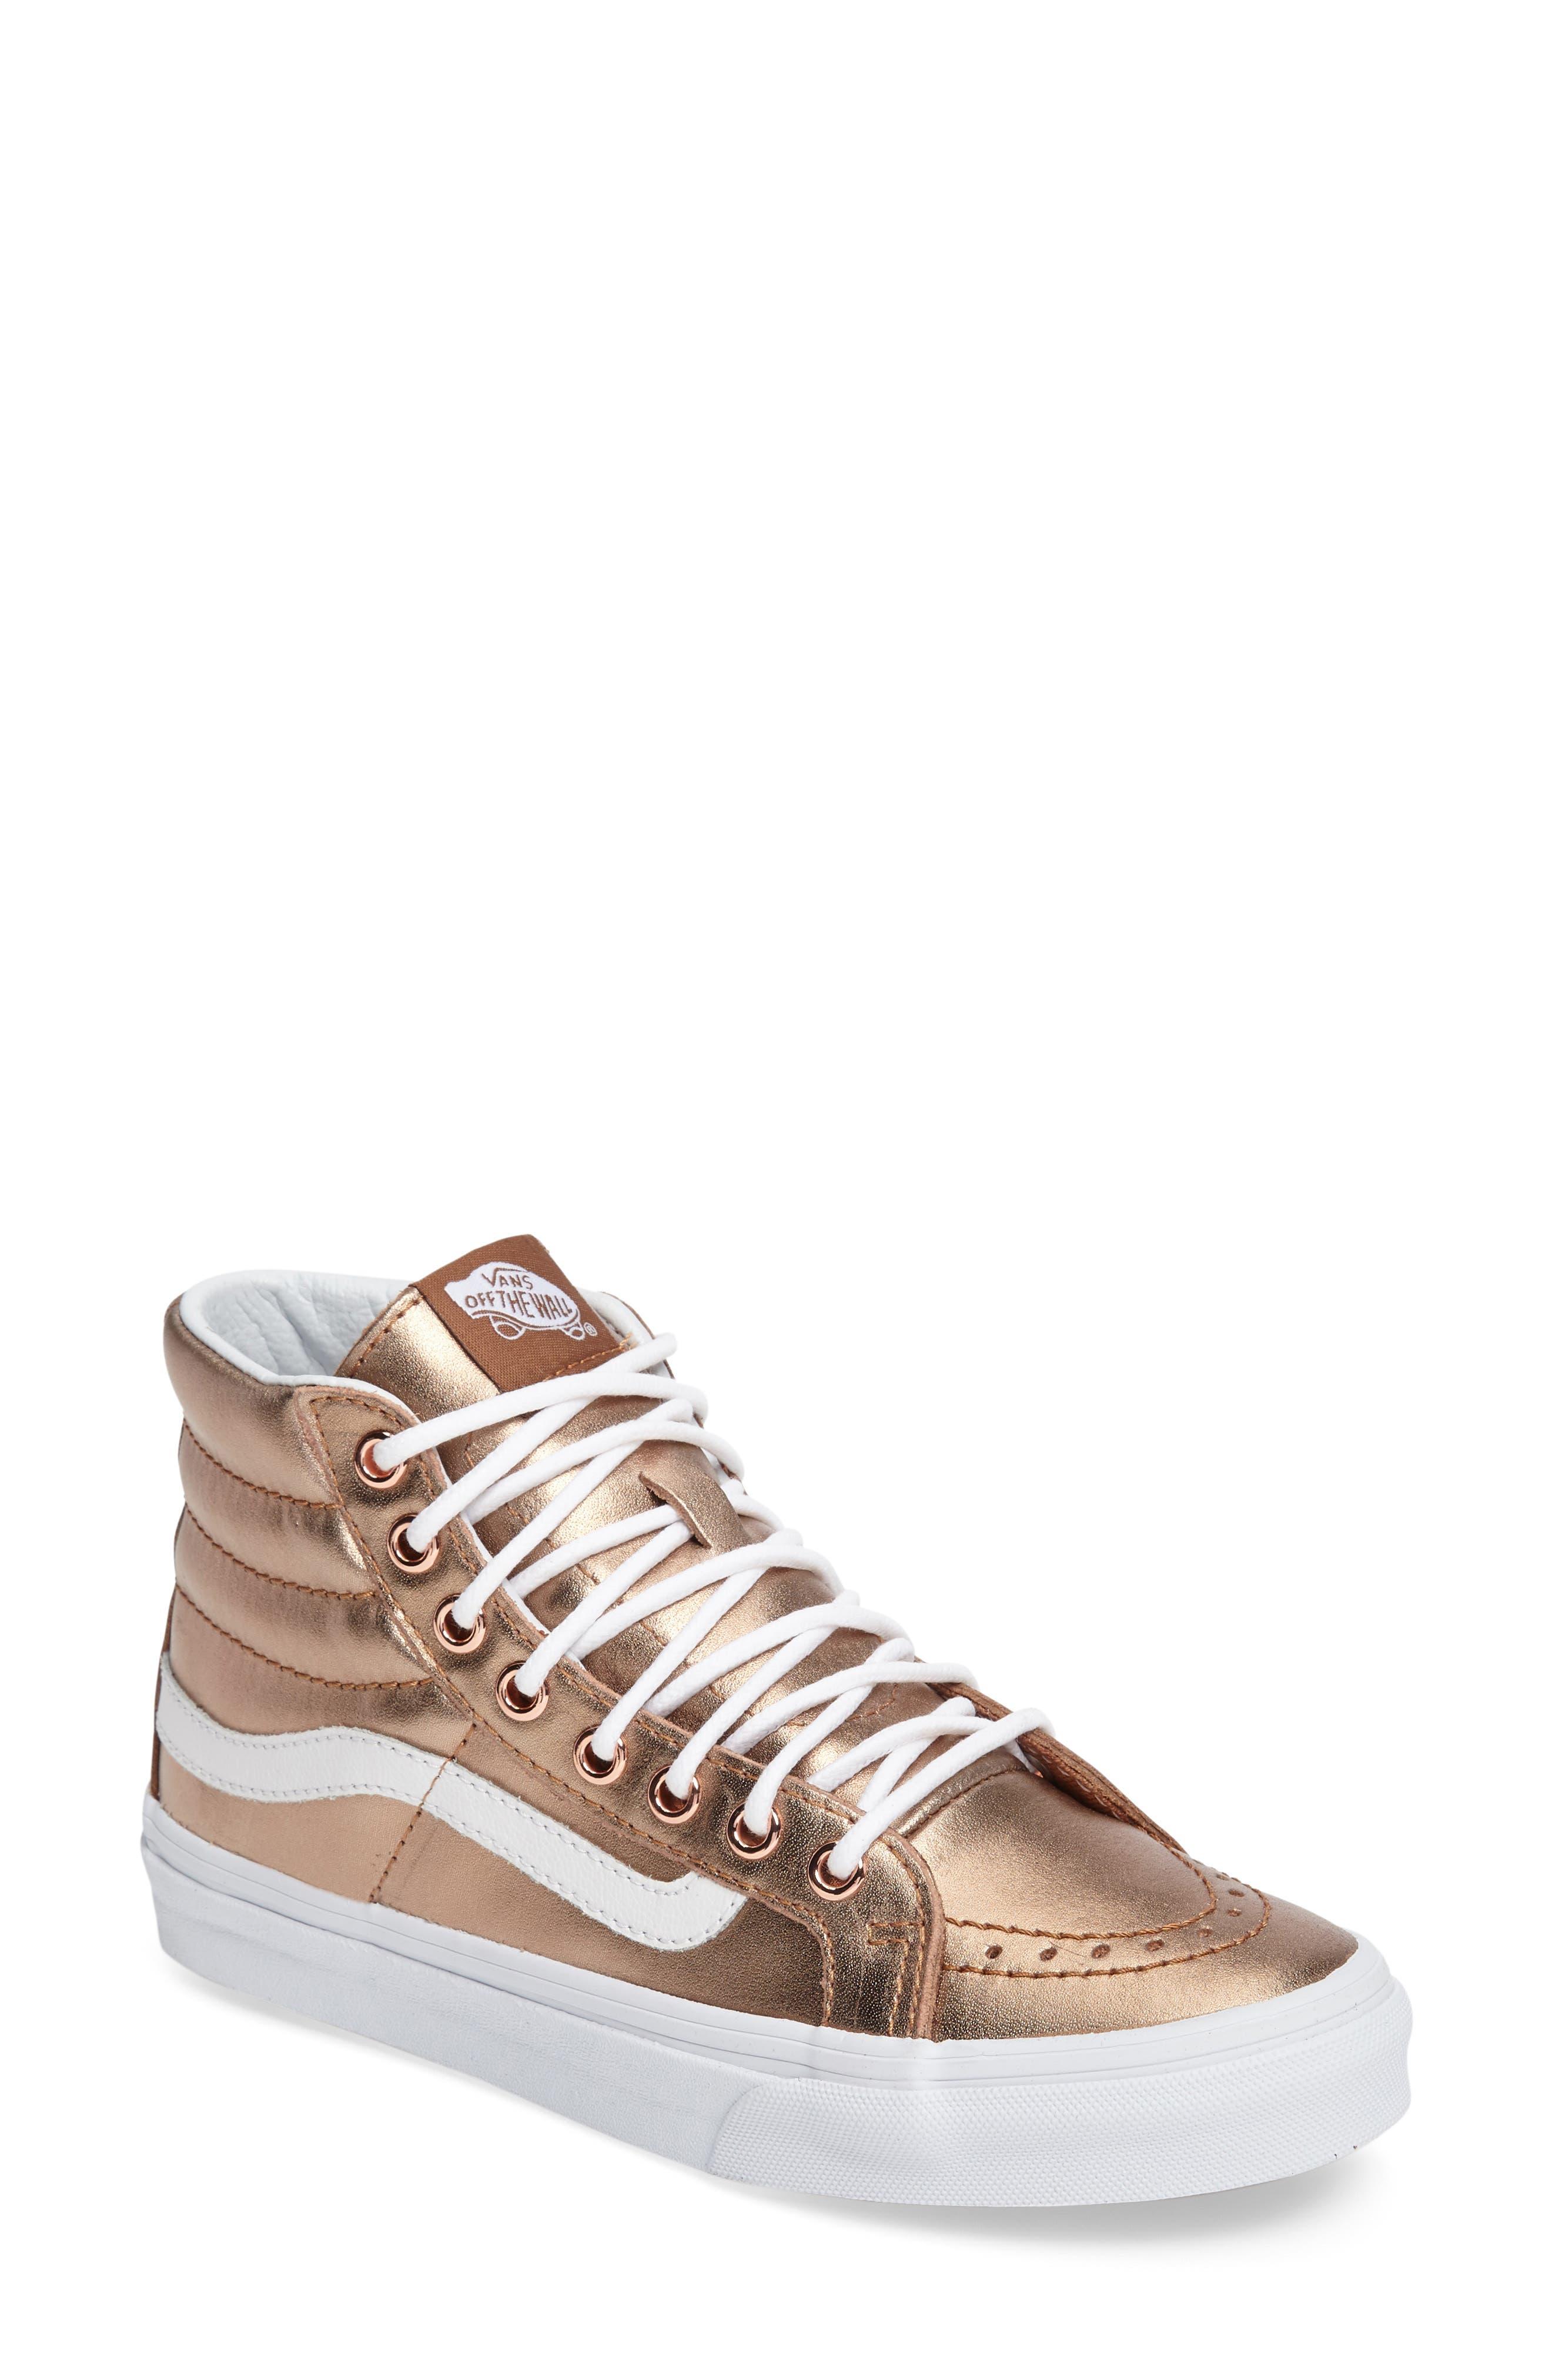 Alternate Image 1 Selected - Vans 'Sk8-Hi Slim' Metallic Leather Sneaker (Women)